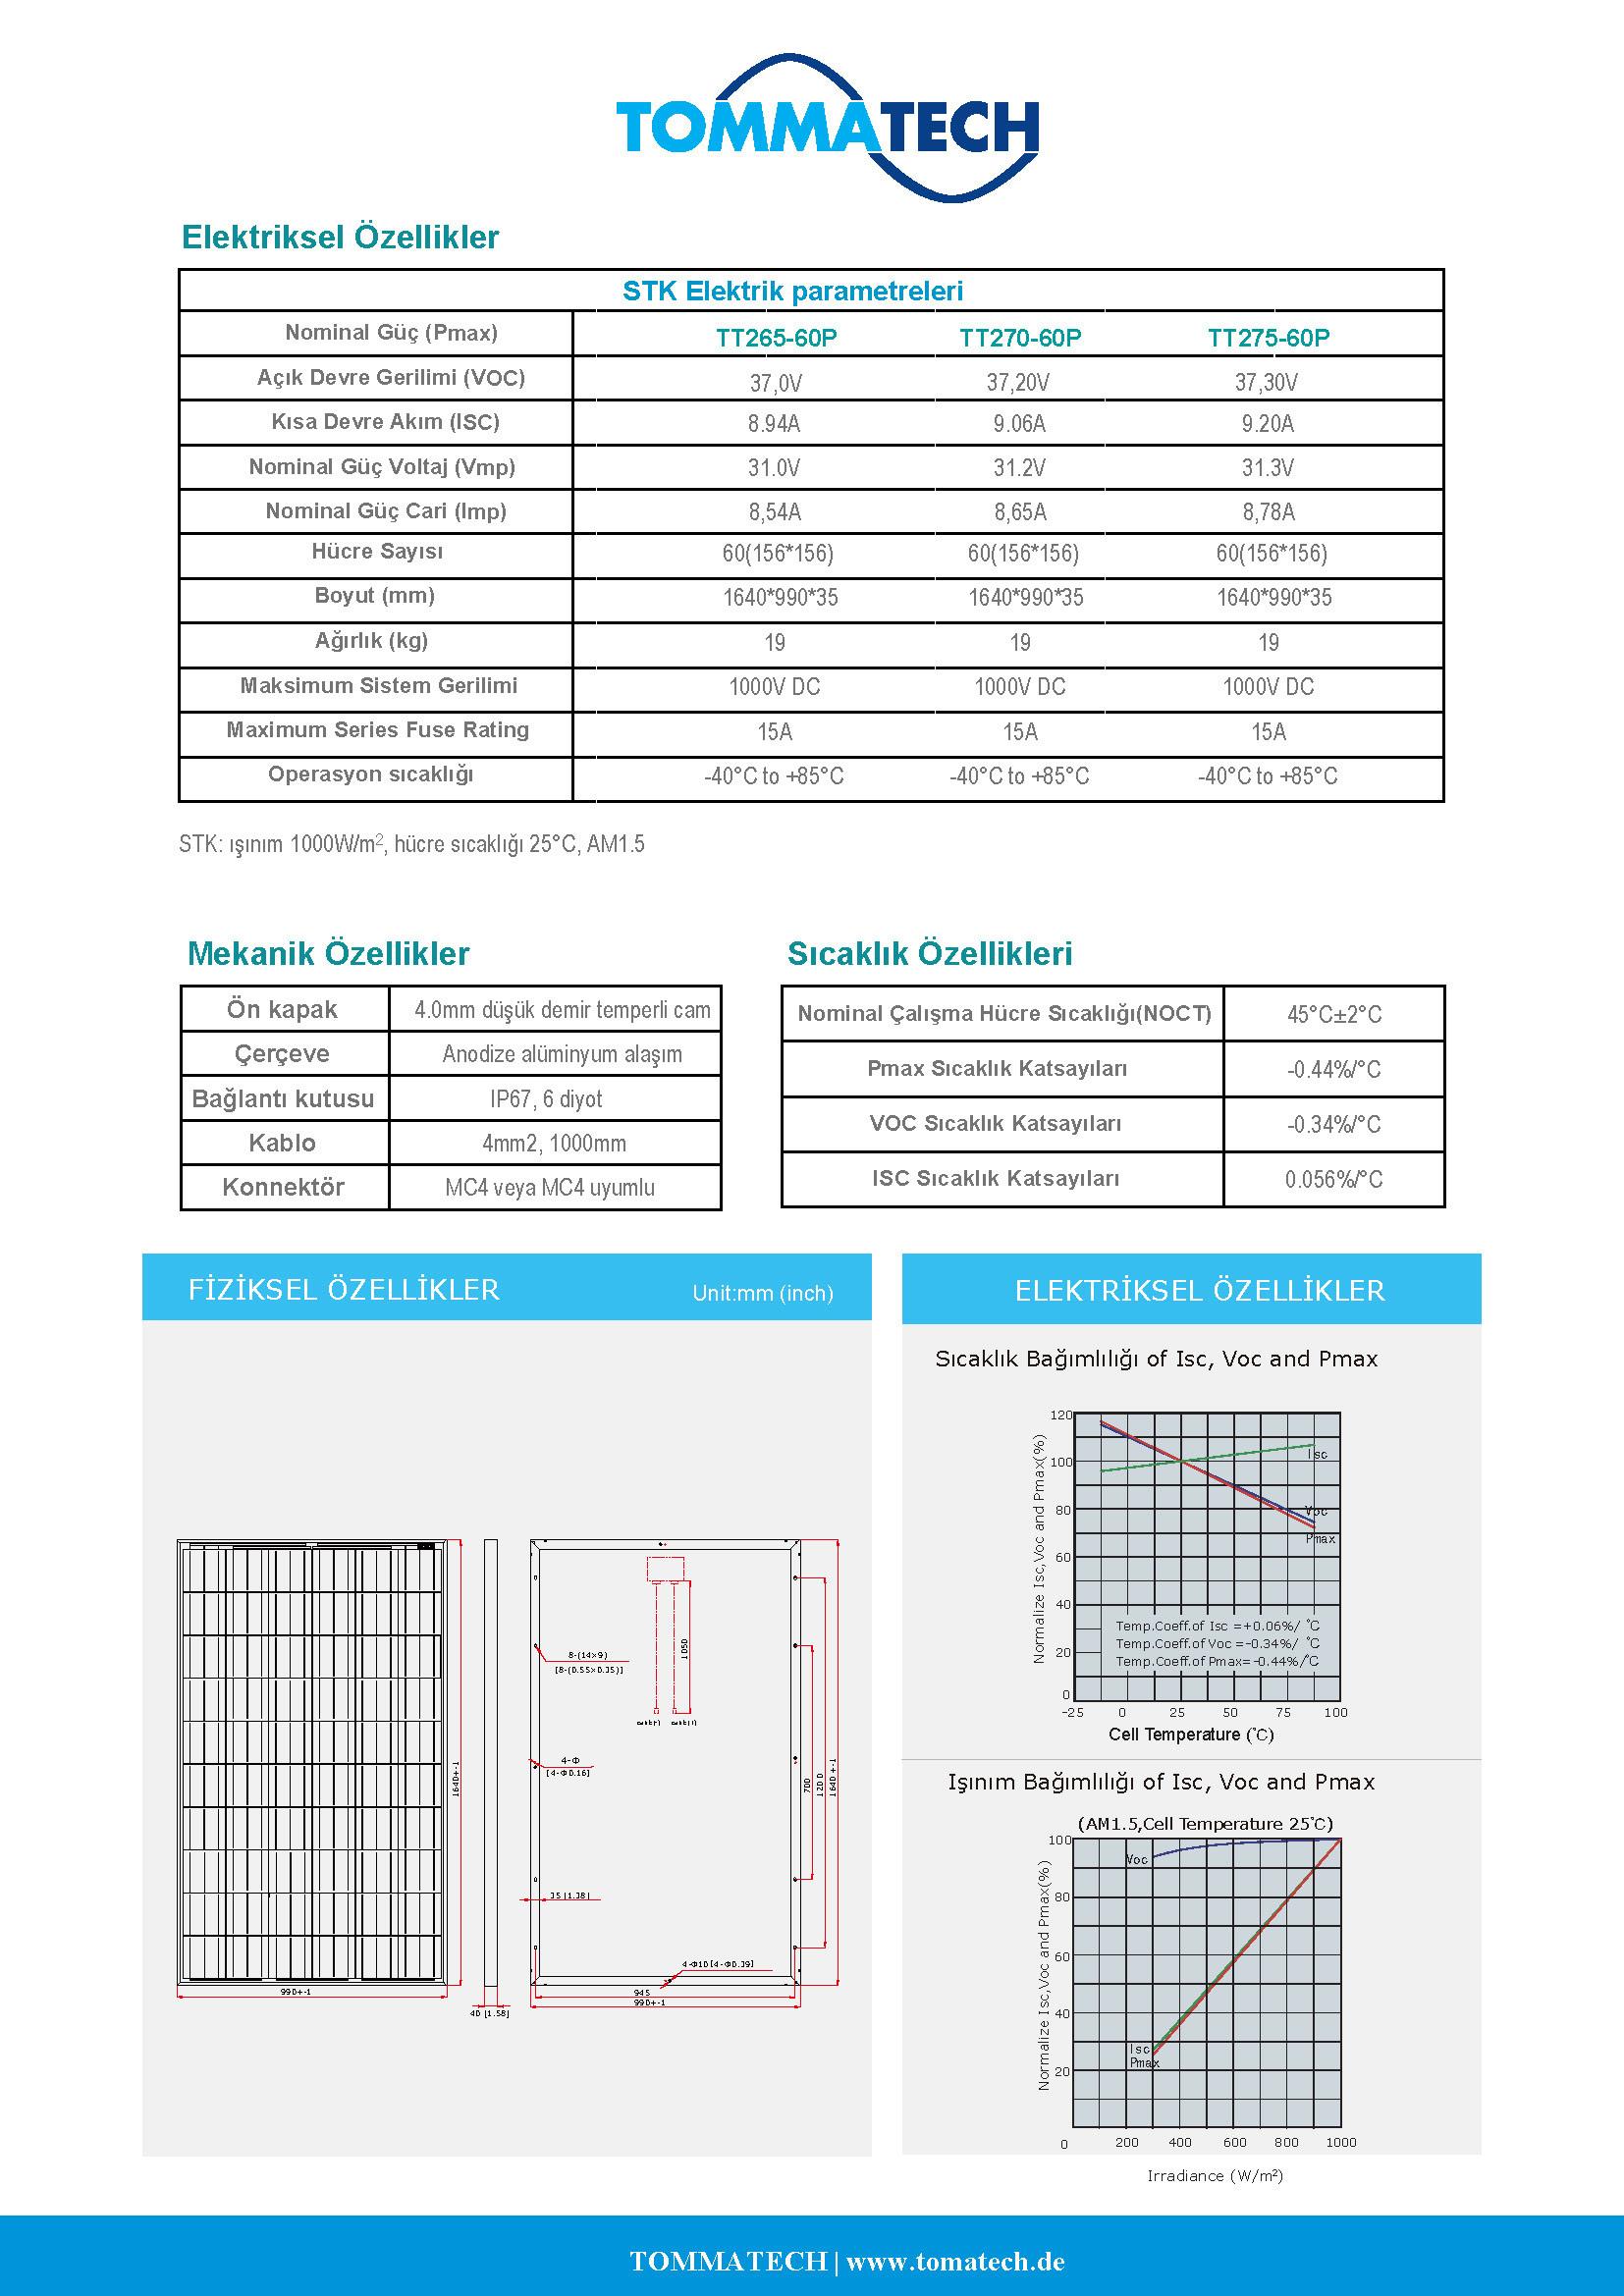 güneş paneli, solar panel, solar panel fiyatları, solar panels, güneş paneli maliyeti, 265 watt , 265 watt solar panel, 265watt